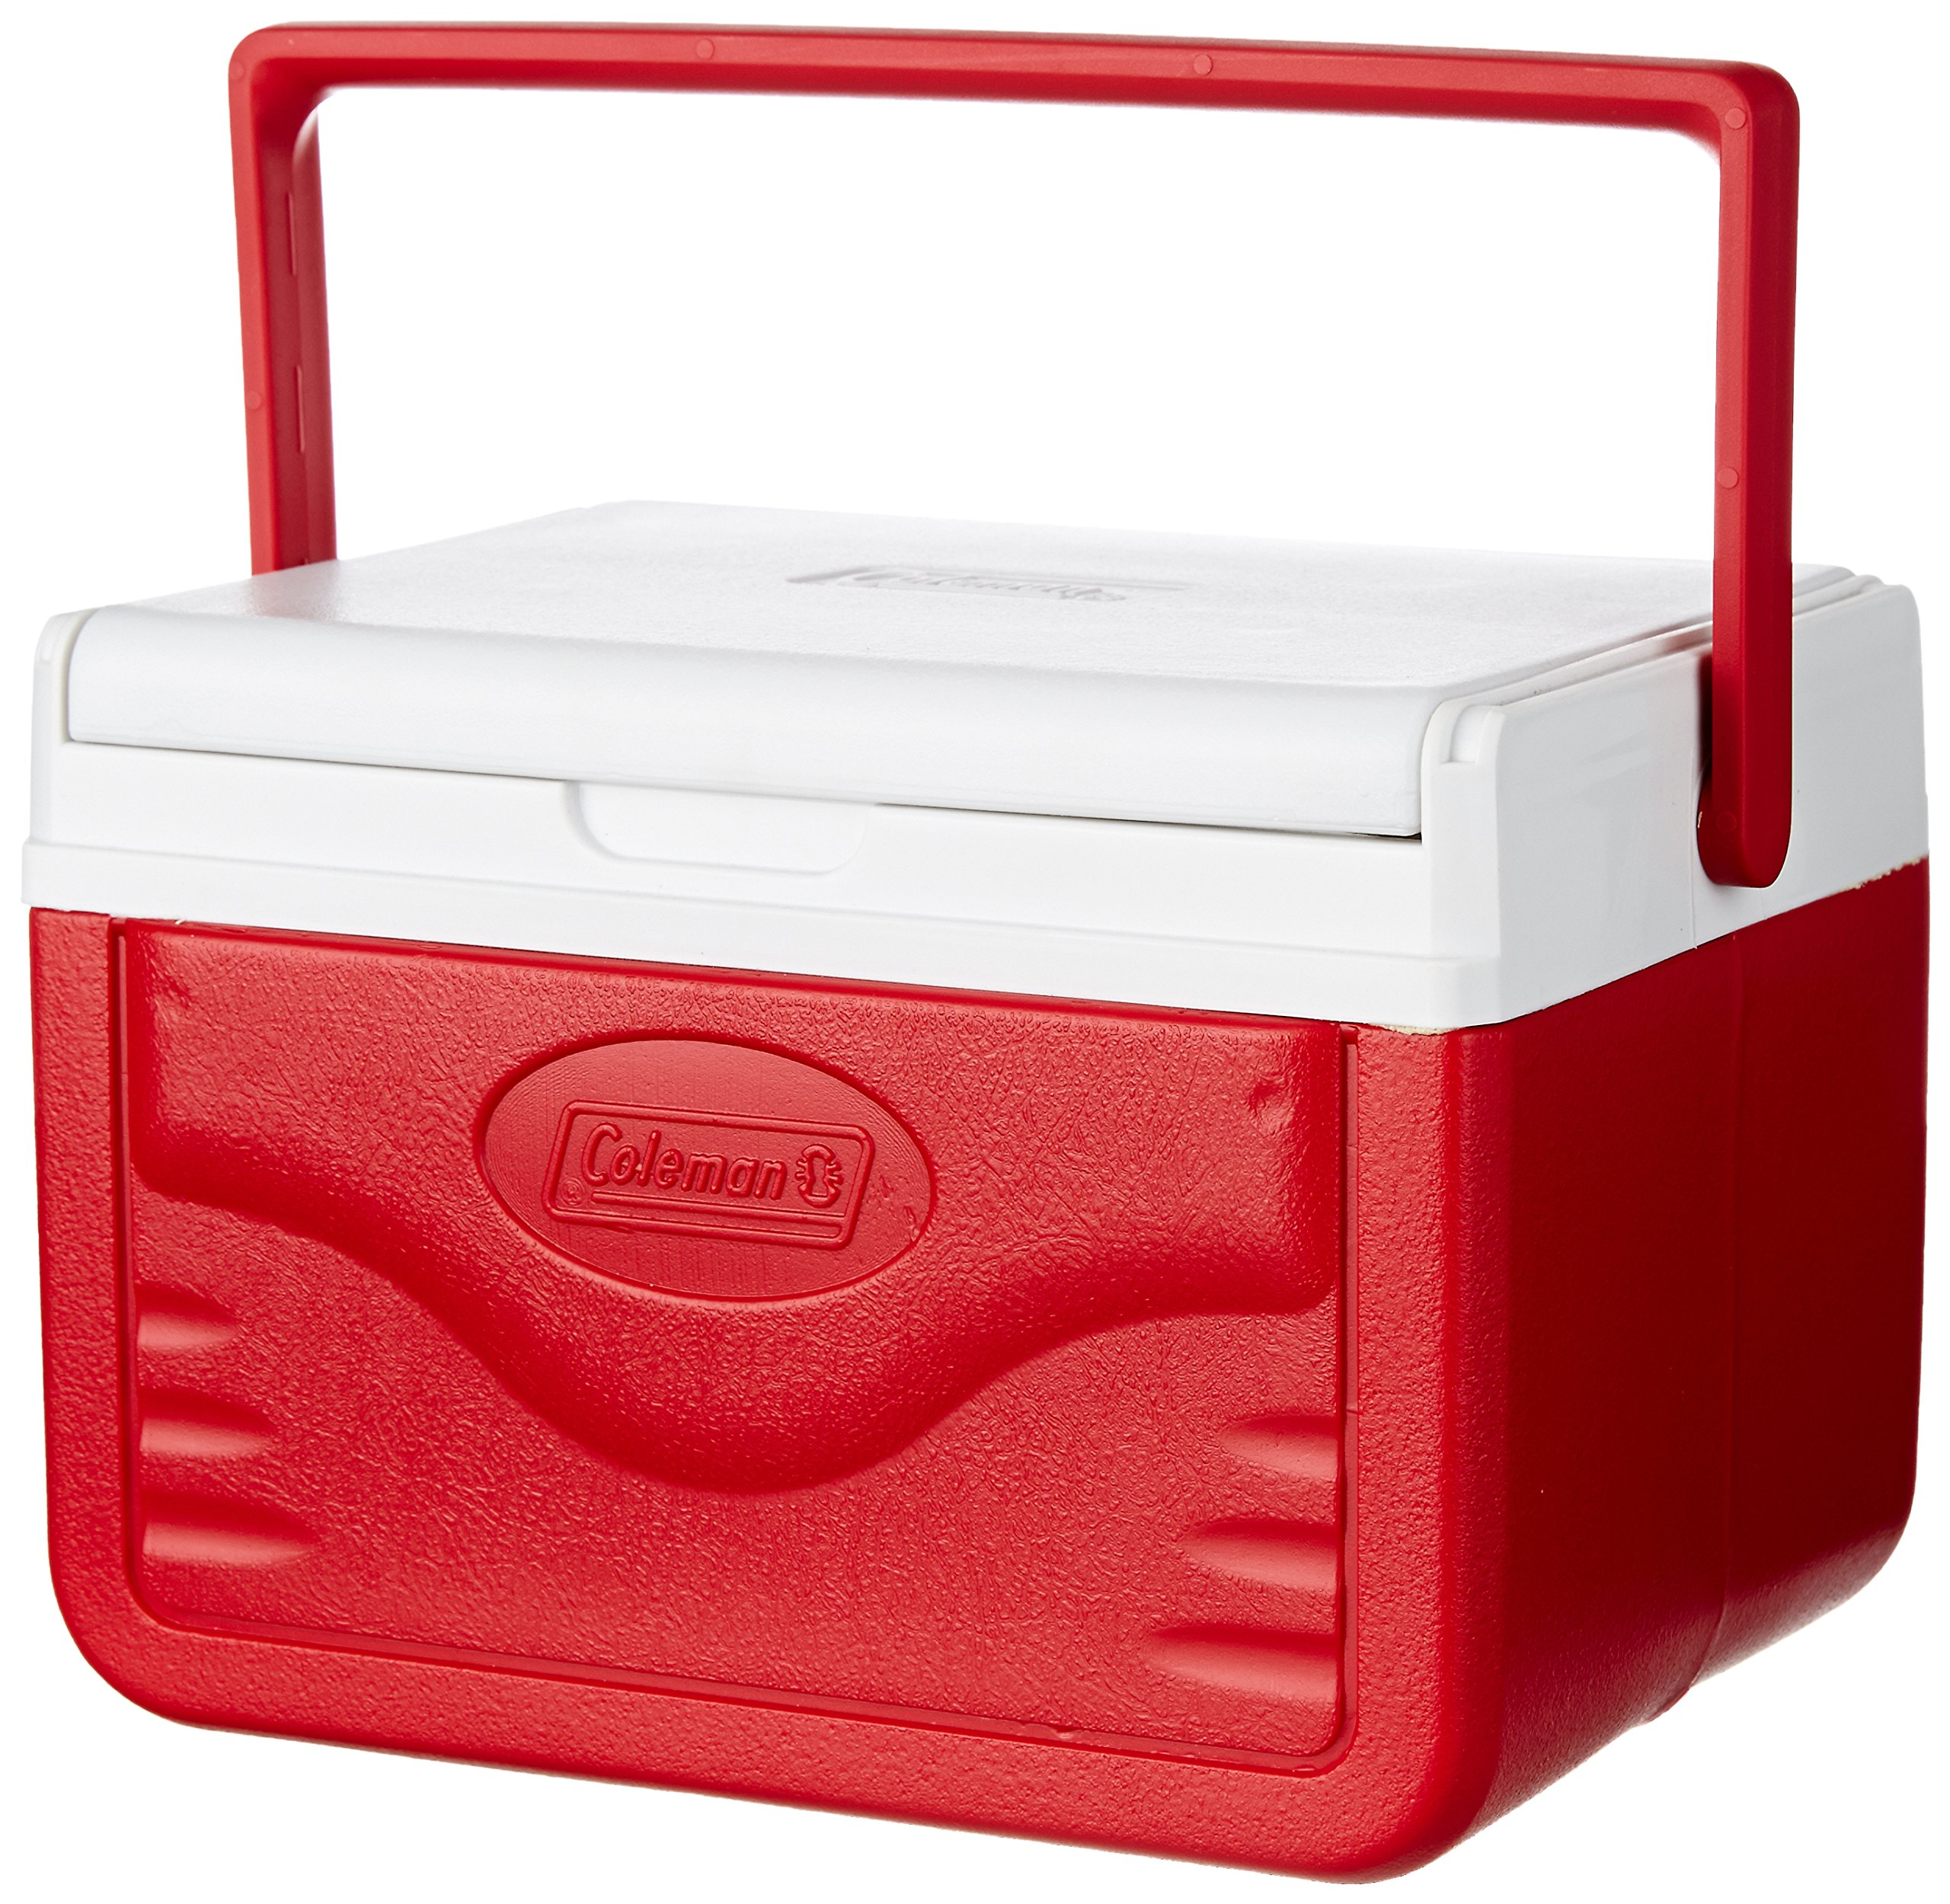 5 Quart FlipLid Cooler Personal Lunch Box Fishing 6 Pack Ice Chest Coleman  sc 1 st  eBay & 5 Quart Flip Lid Cooler Personal Lunch Box Fishing 6 Pack Ice ... Aboutintivar.Com